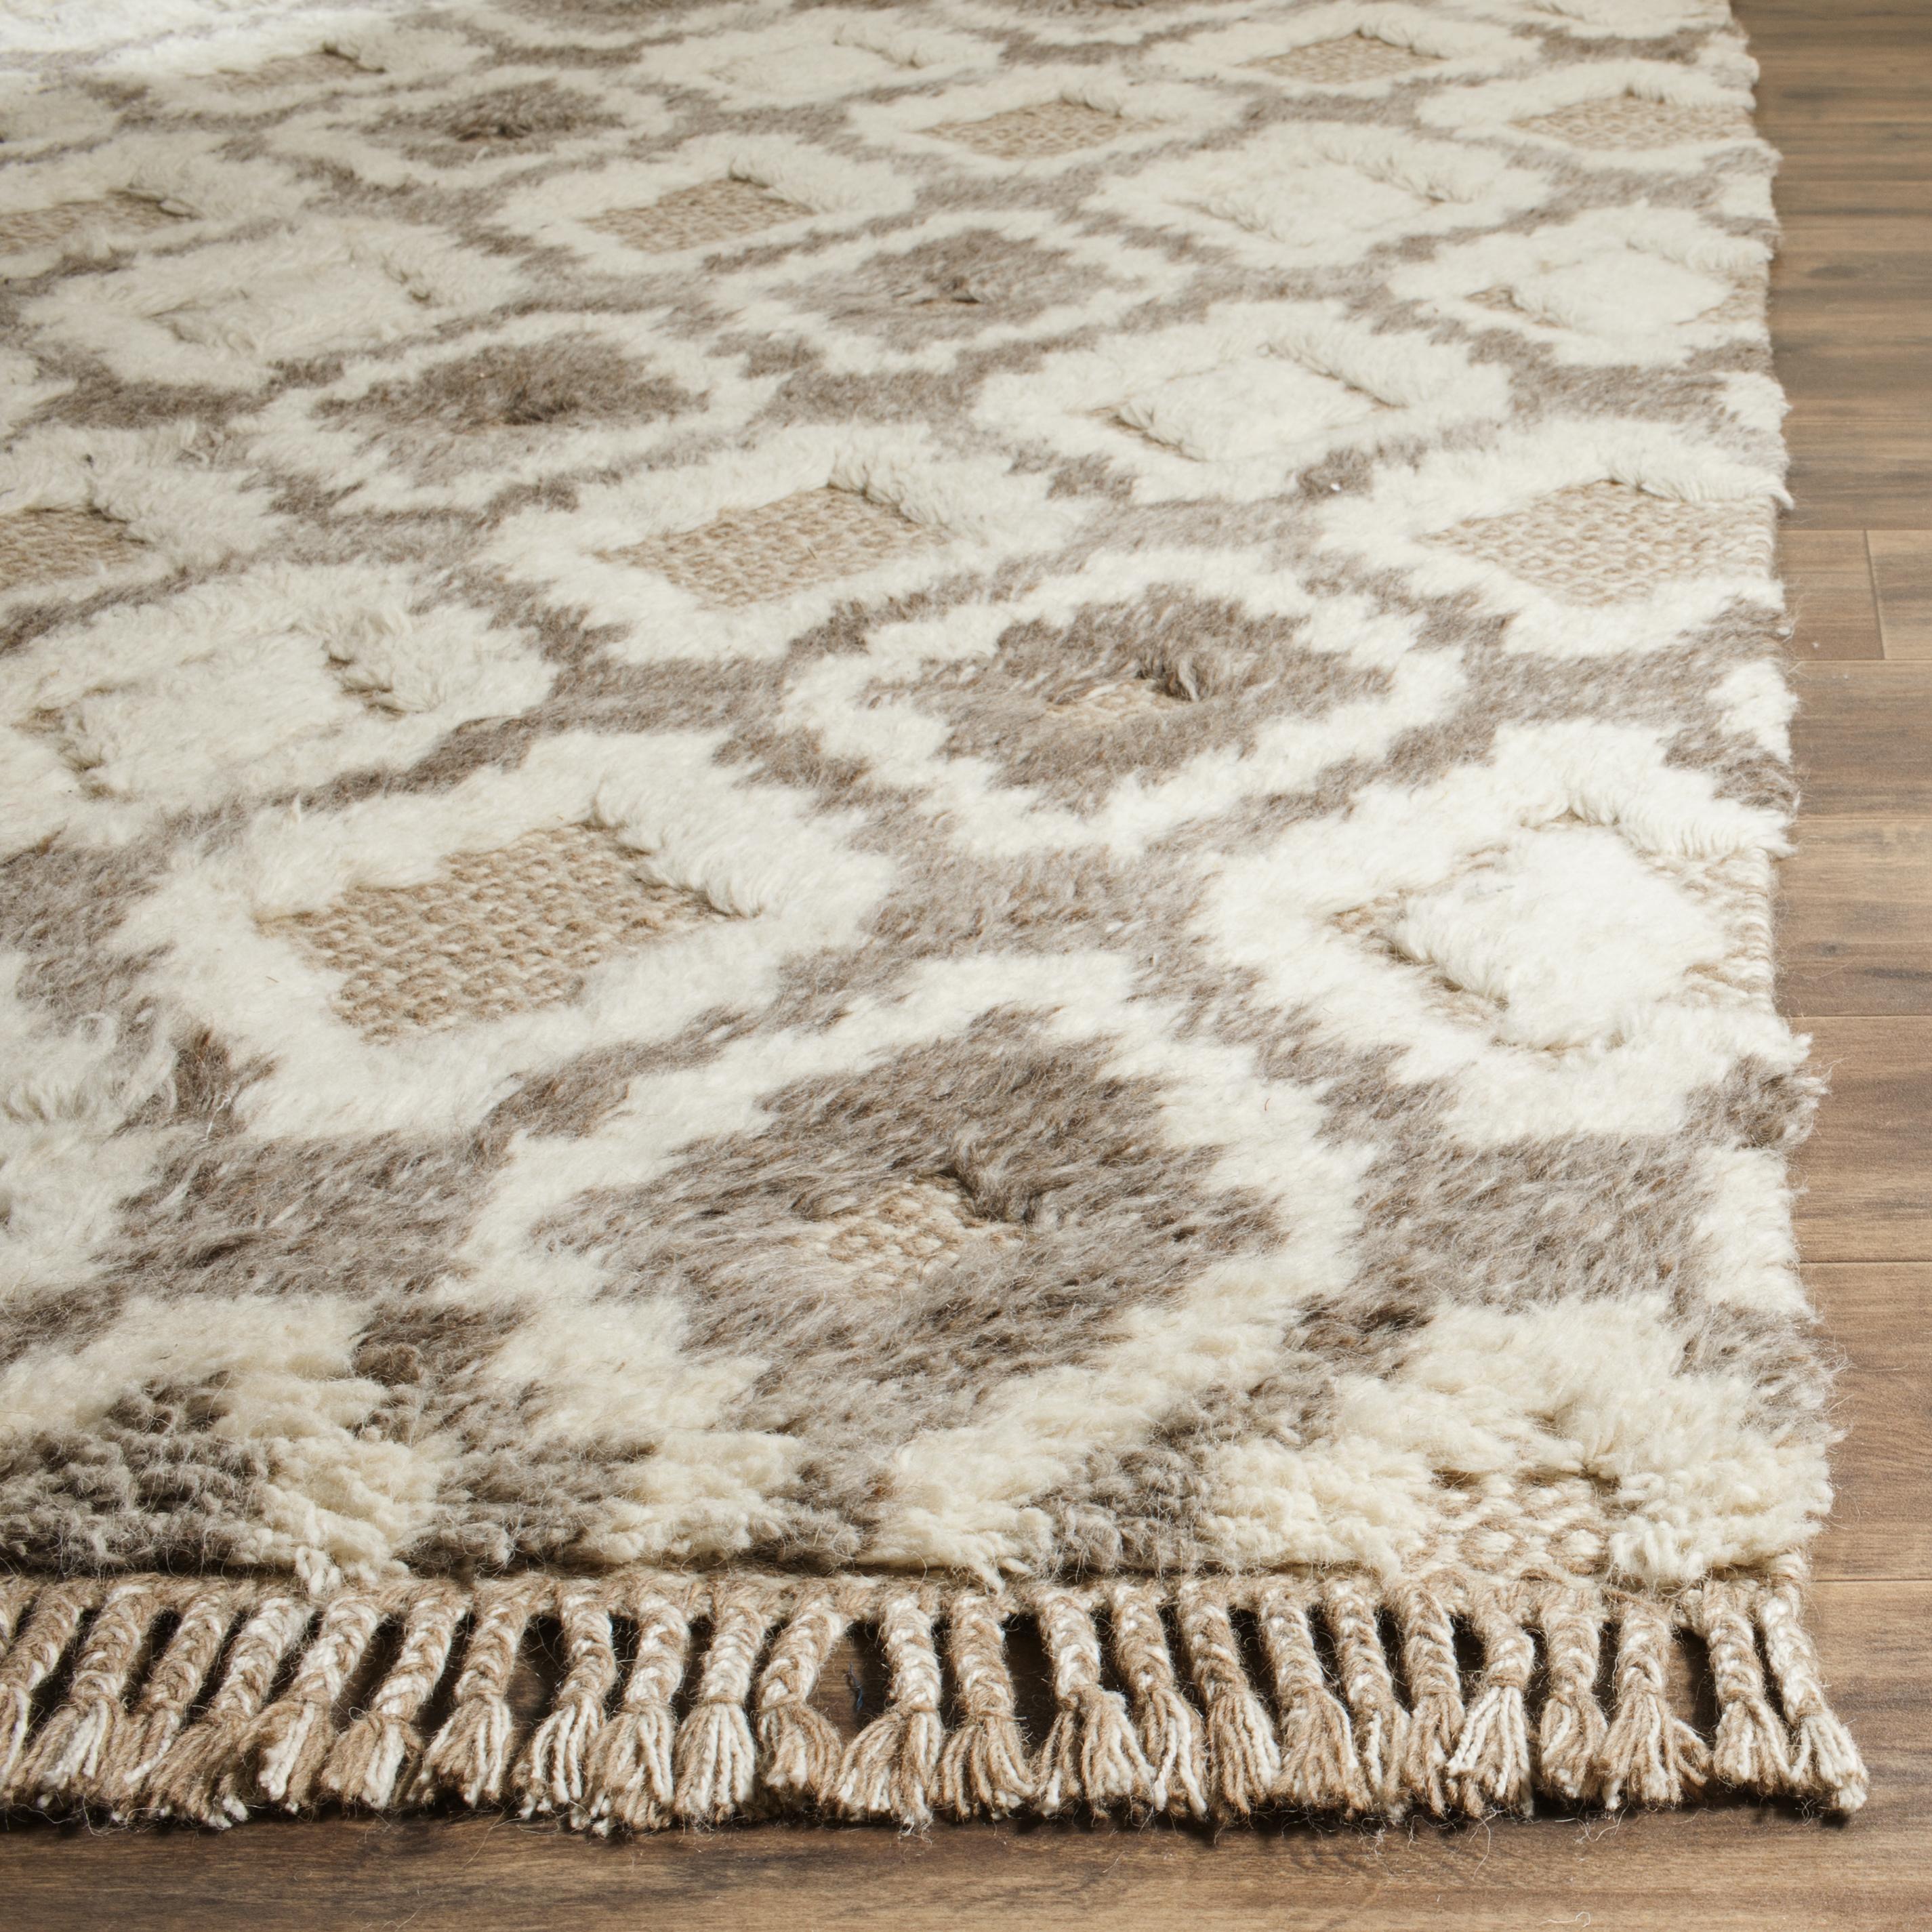 Gypsy 807 8' X 10' Natural Wool Rug